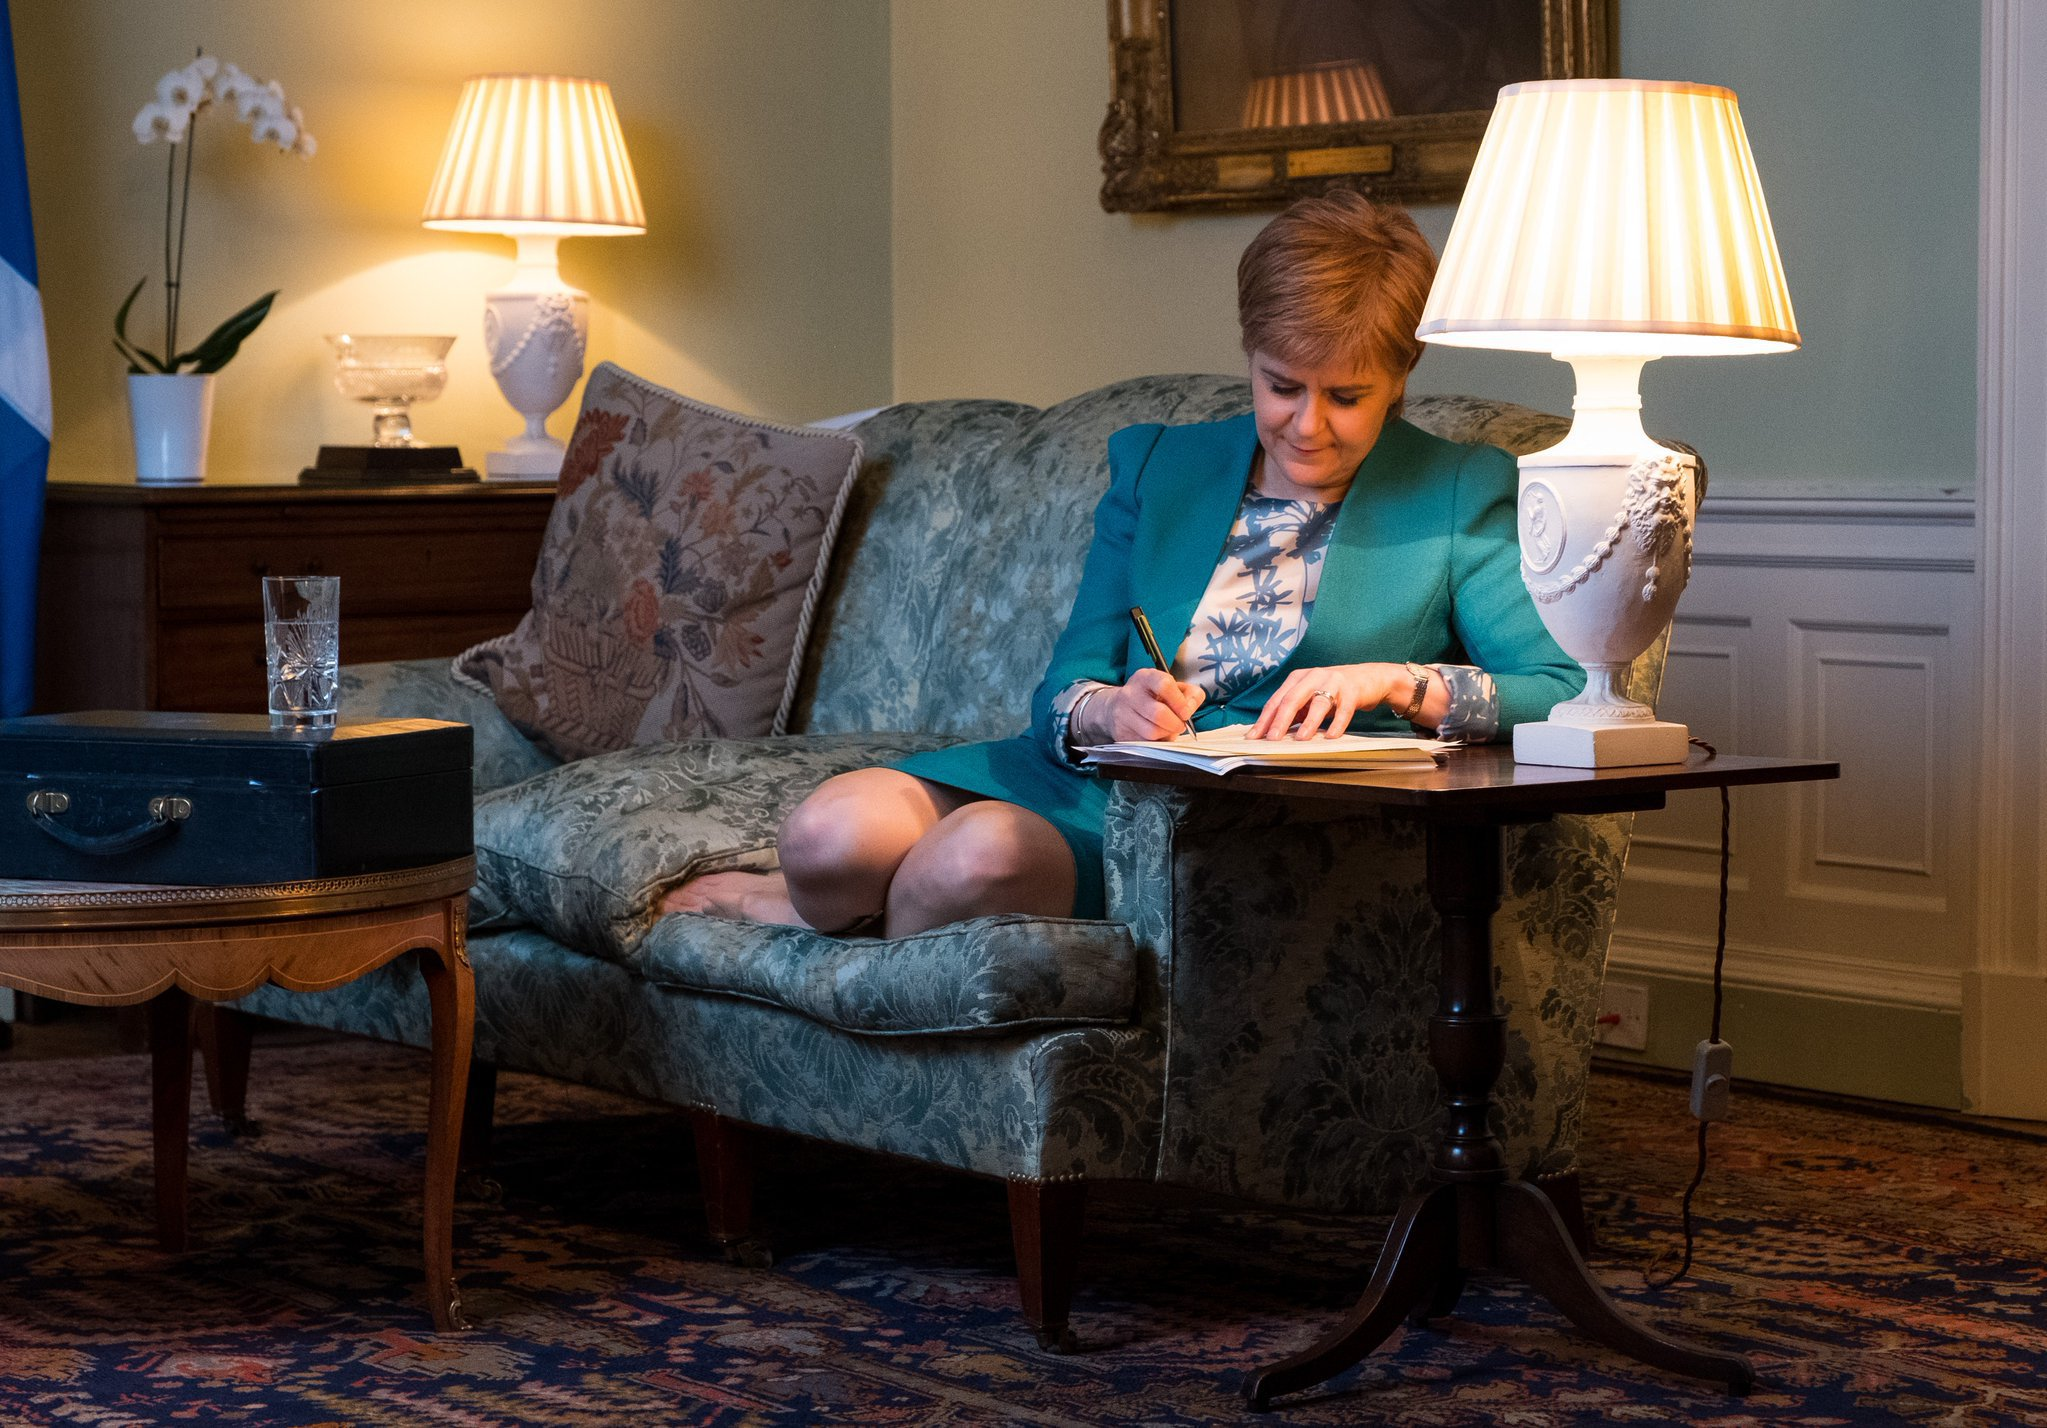 Nicola Sturgeon writes letter requesting Scottish referendum